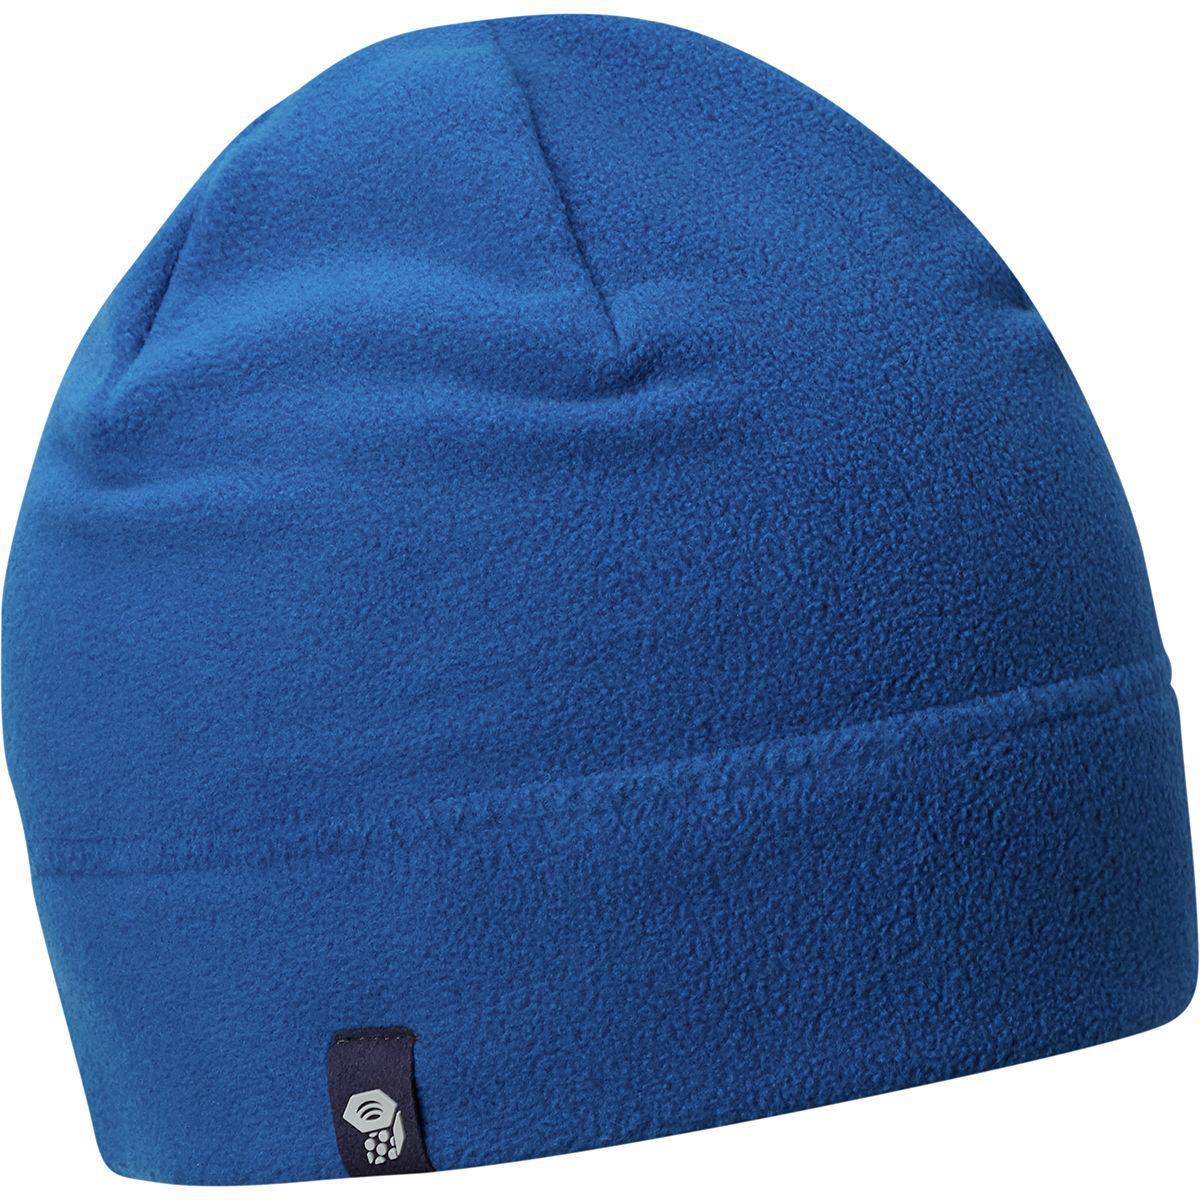 Large Nightfall Blue//Hardwear Navy Mountain Hardwear Mens Dome Perignon Lite